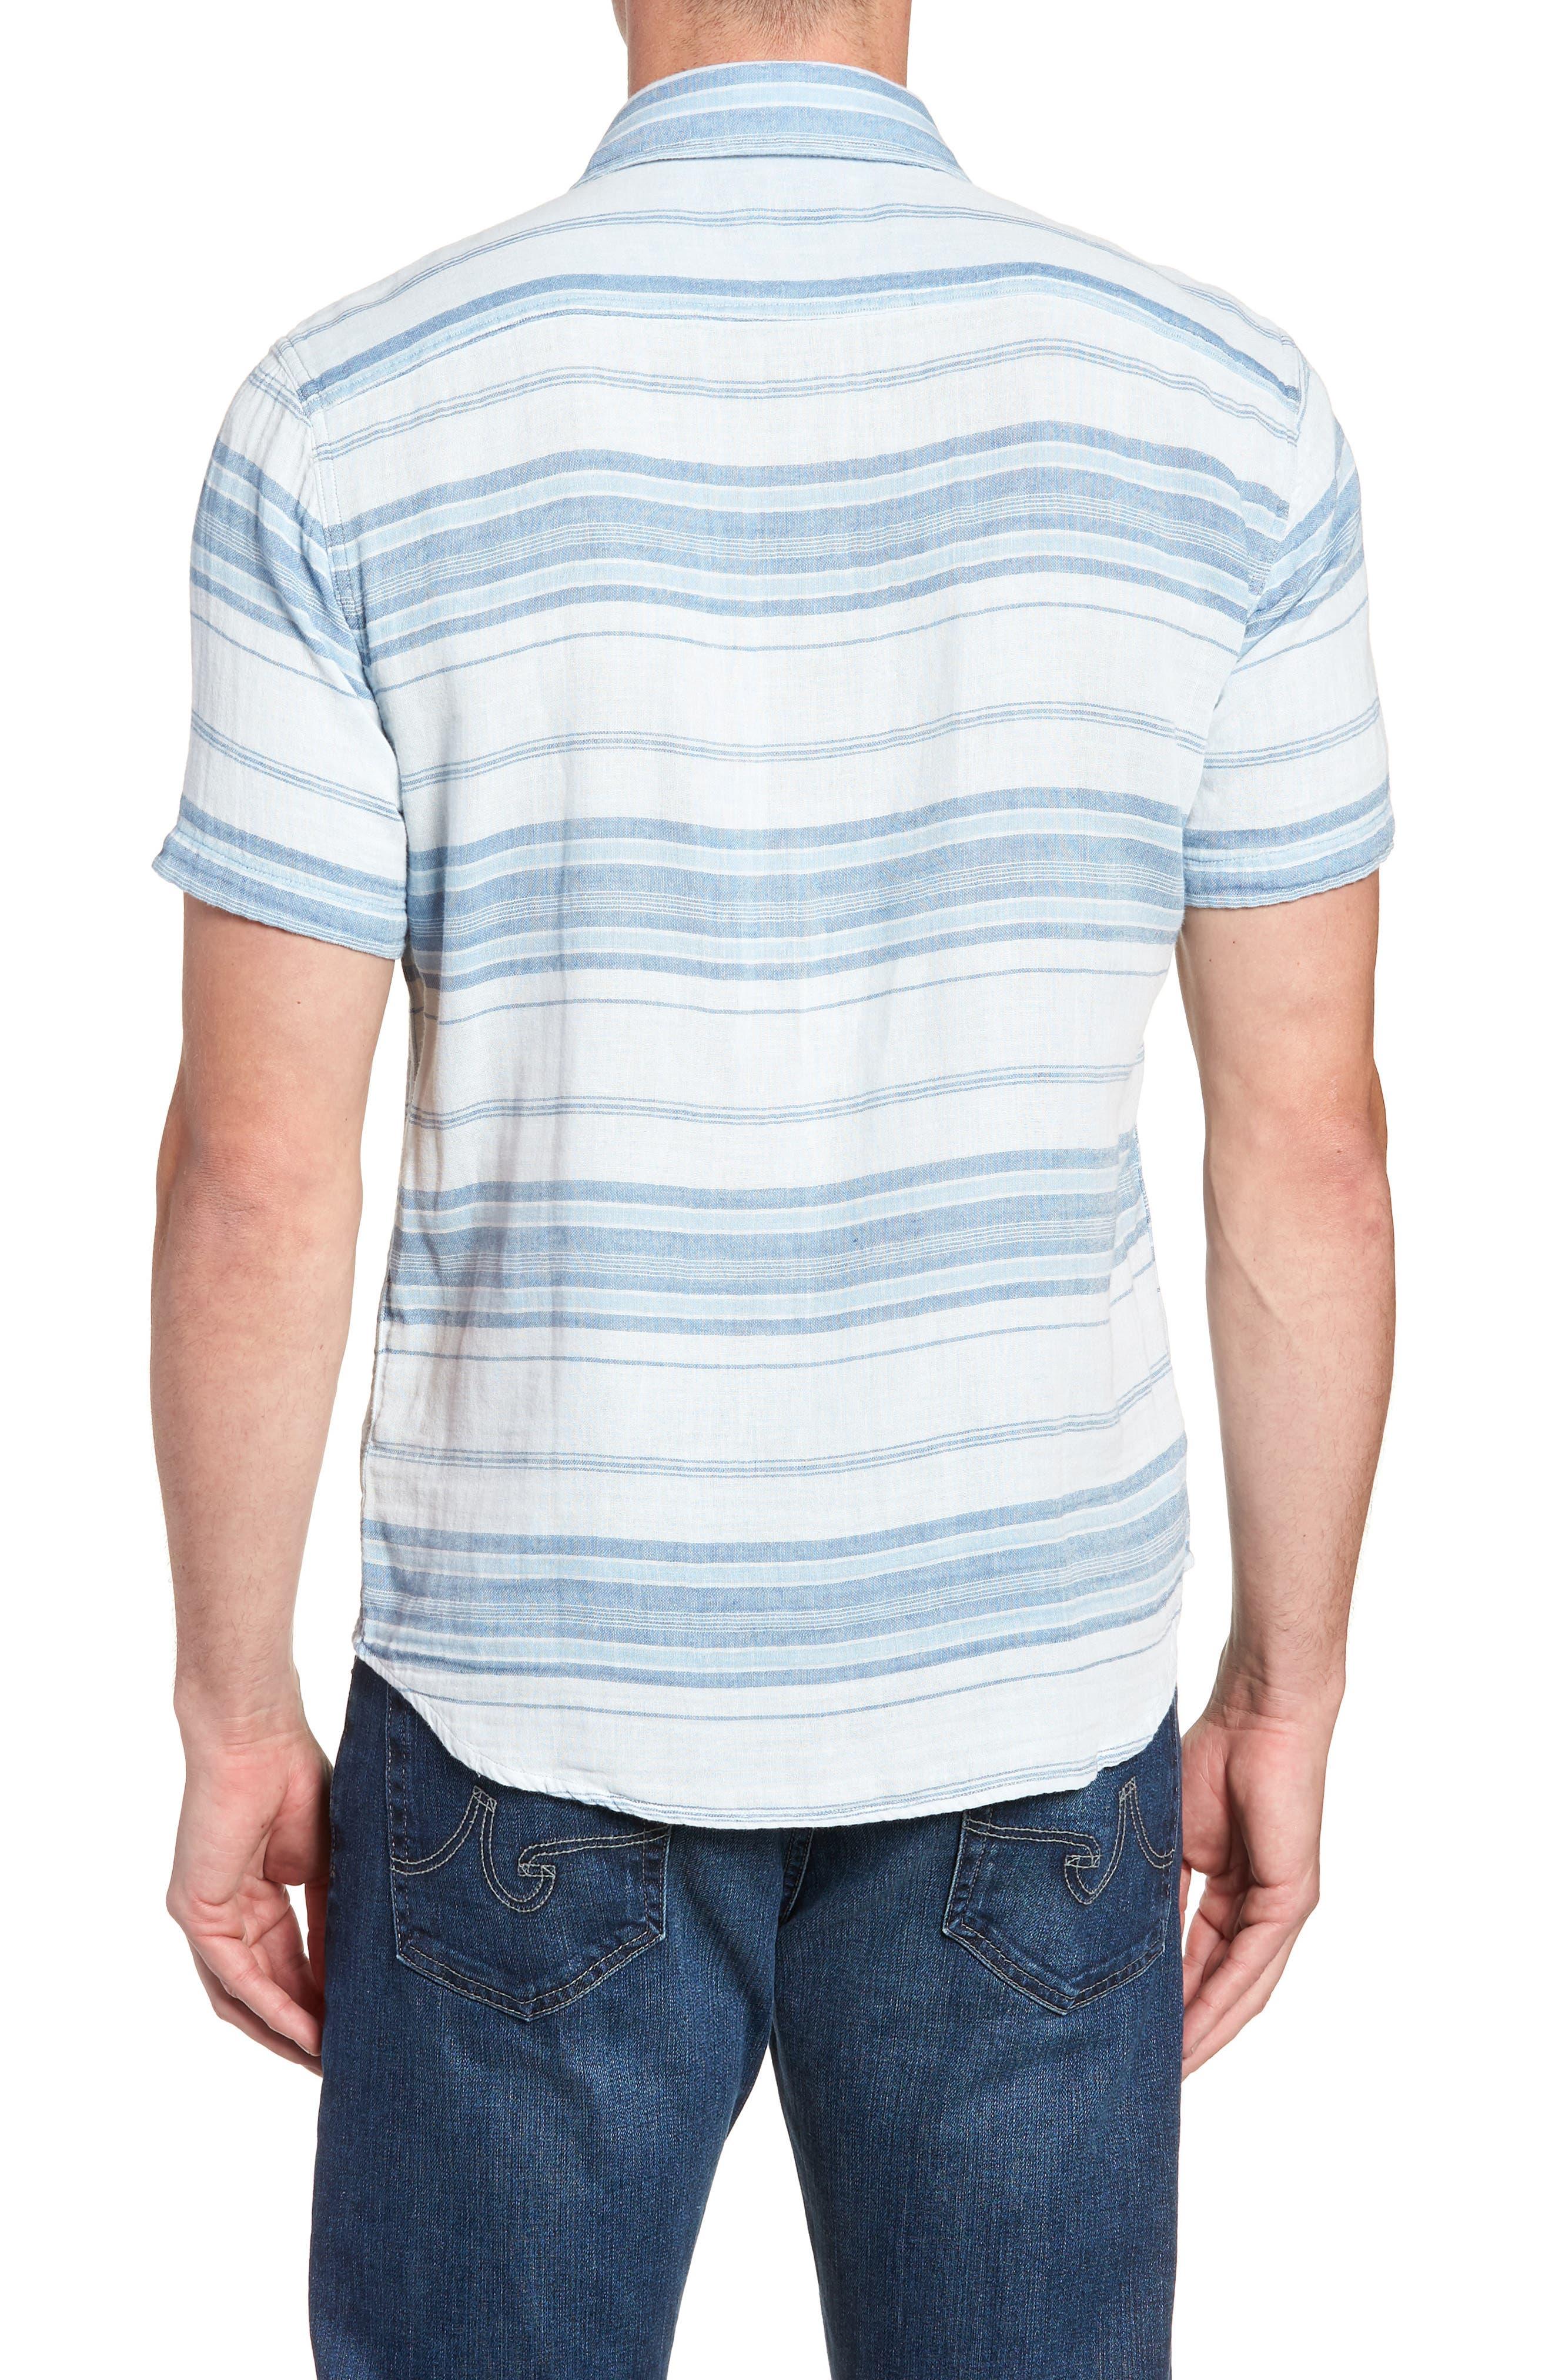 Ventura Double Cloth Short Sleeve Shirt,                             Alternate thumbnail 3, color,                             Light Indigo Serape